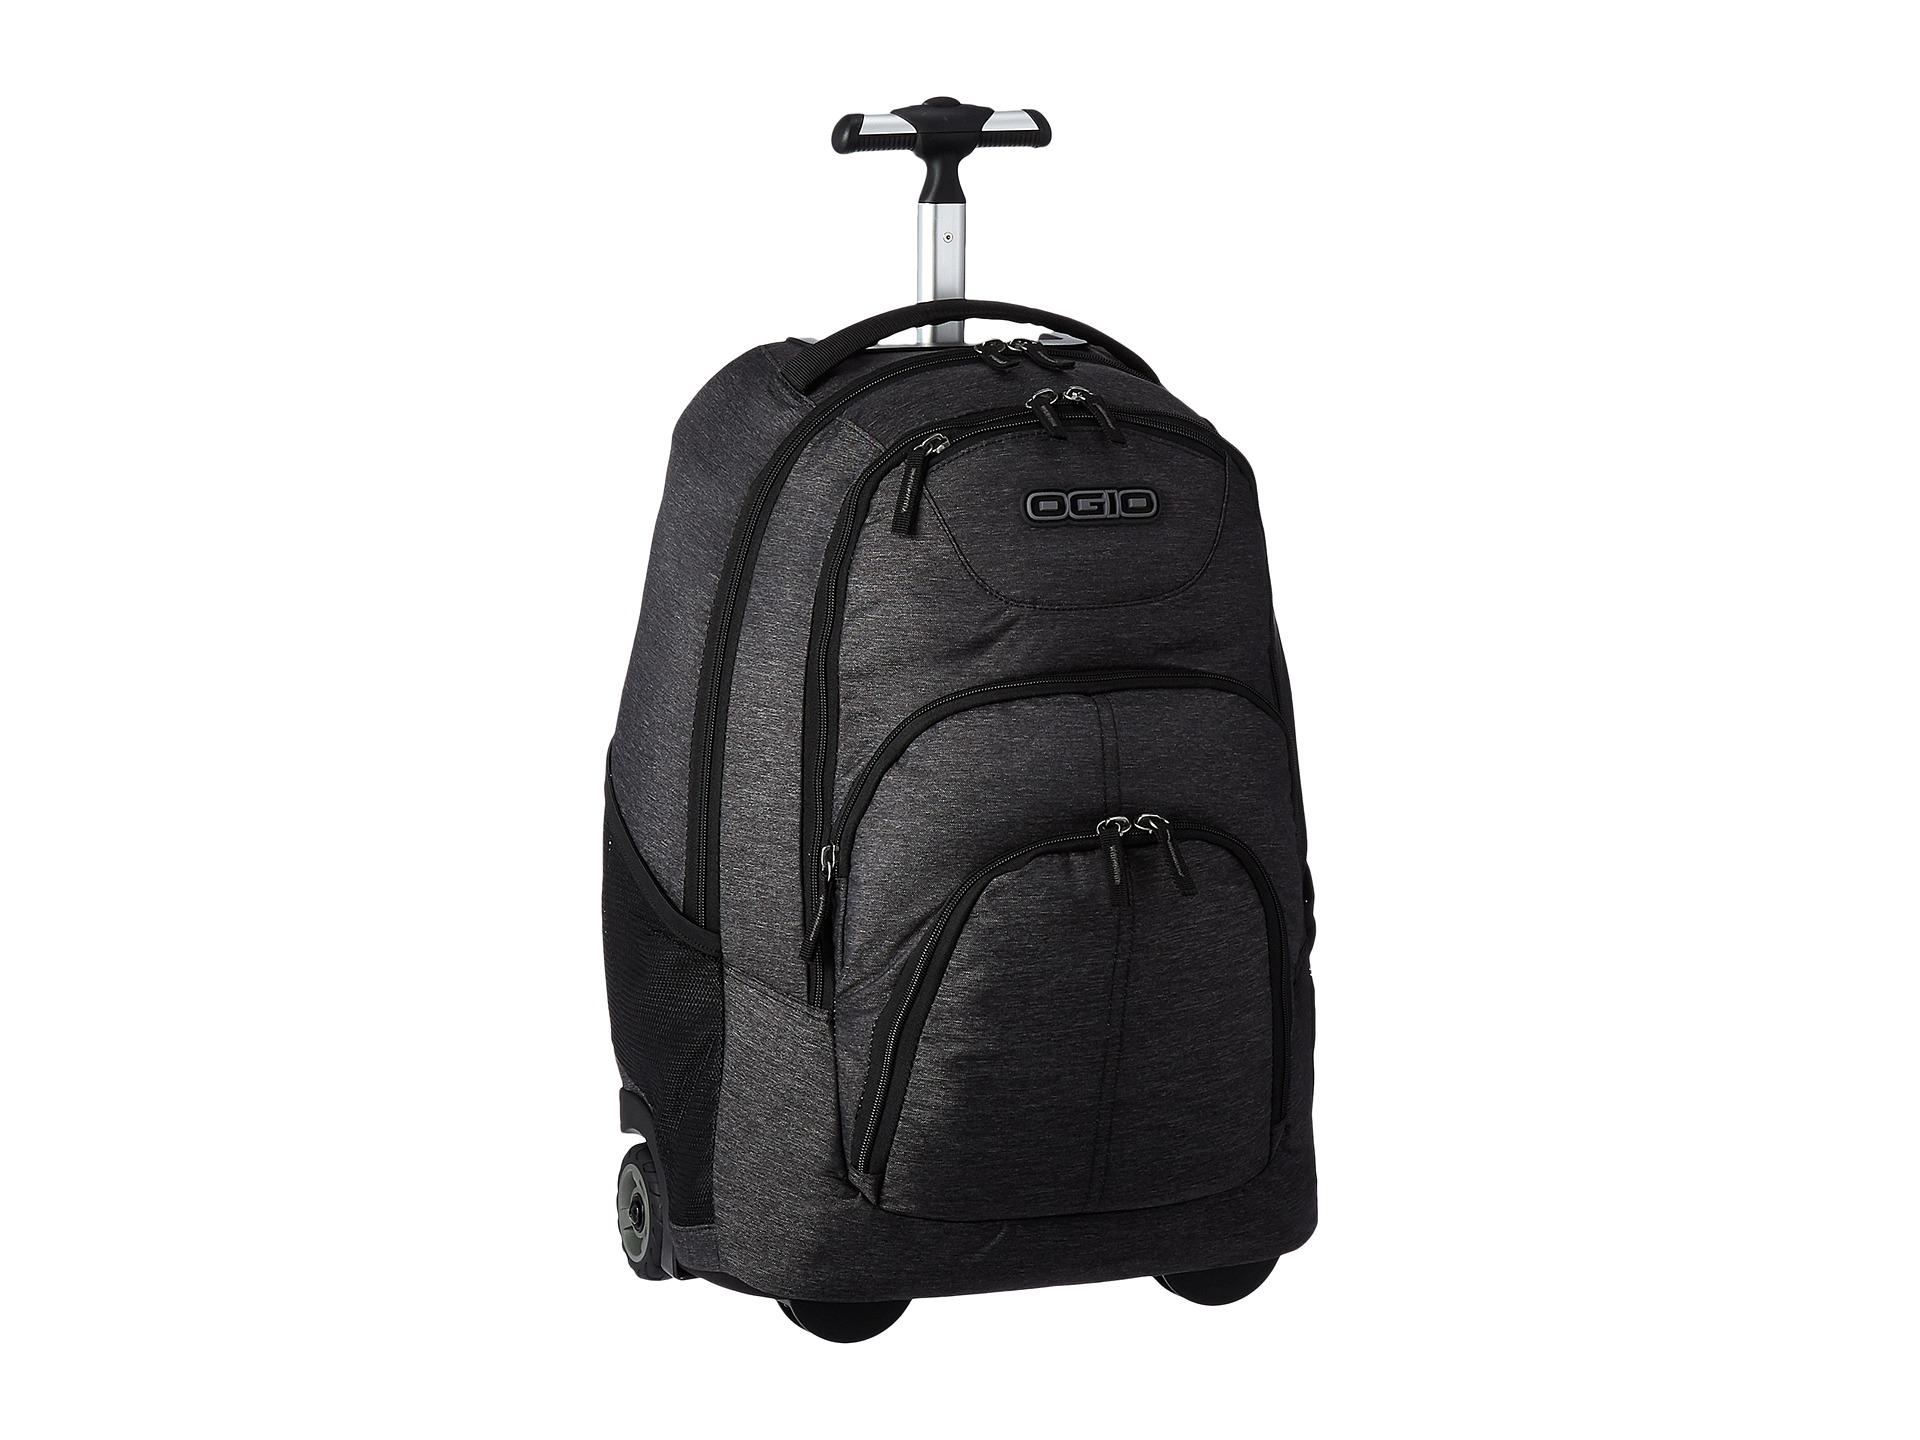 OGIO Phantom Wheeled Pack - Zappos.com Free Shipping BOTH Ways